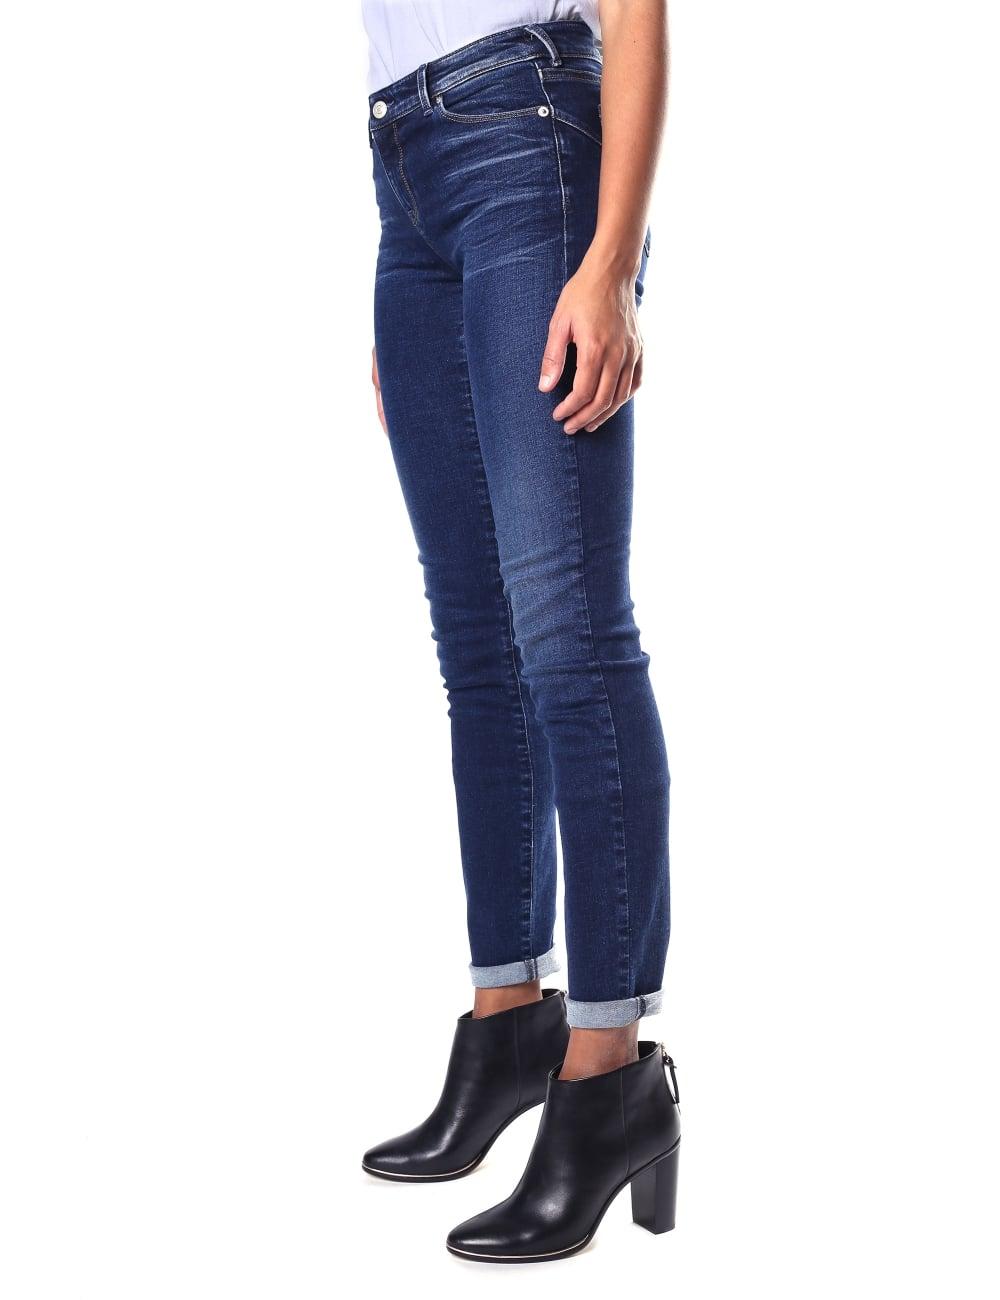 watch 18915 9d7a6 Women's Push Up Fit Jeans